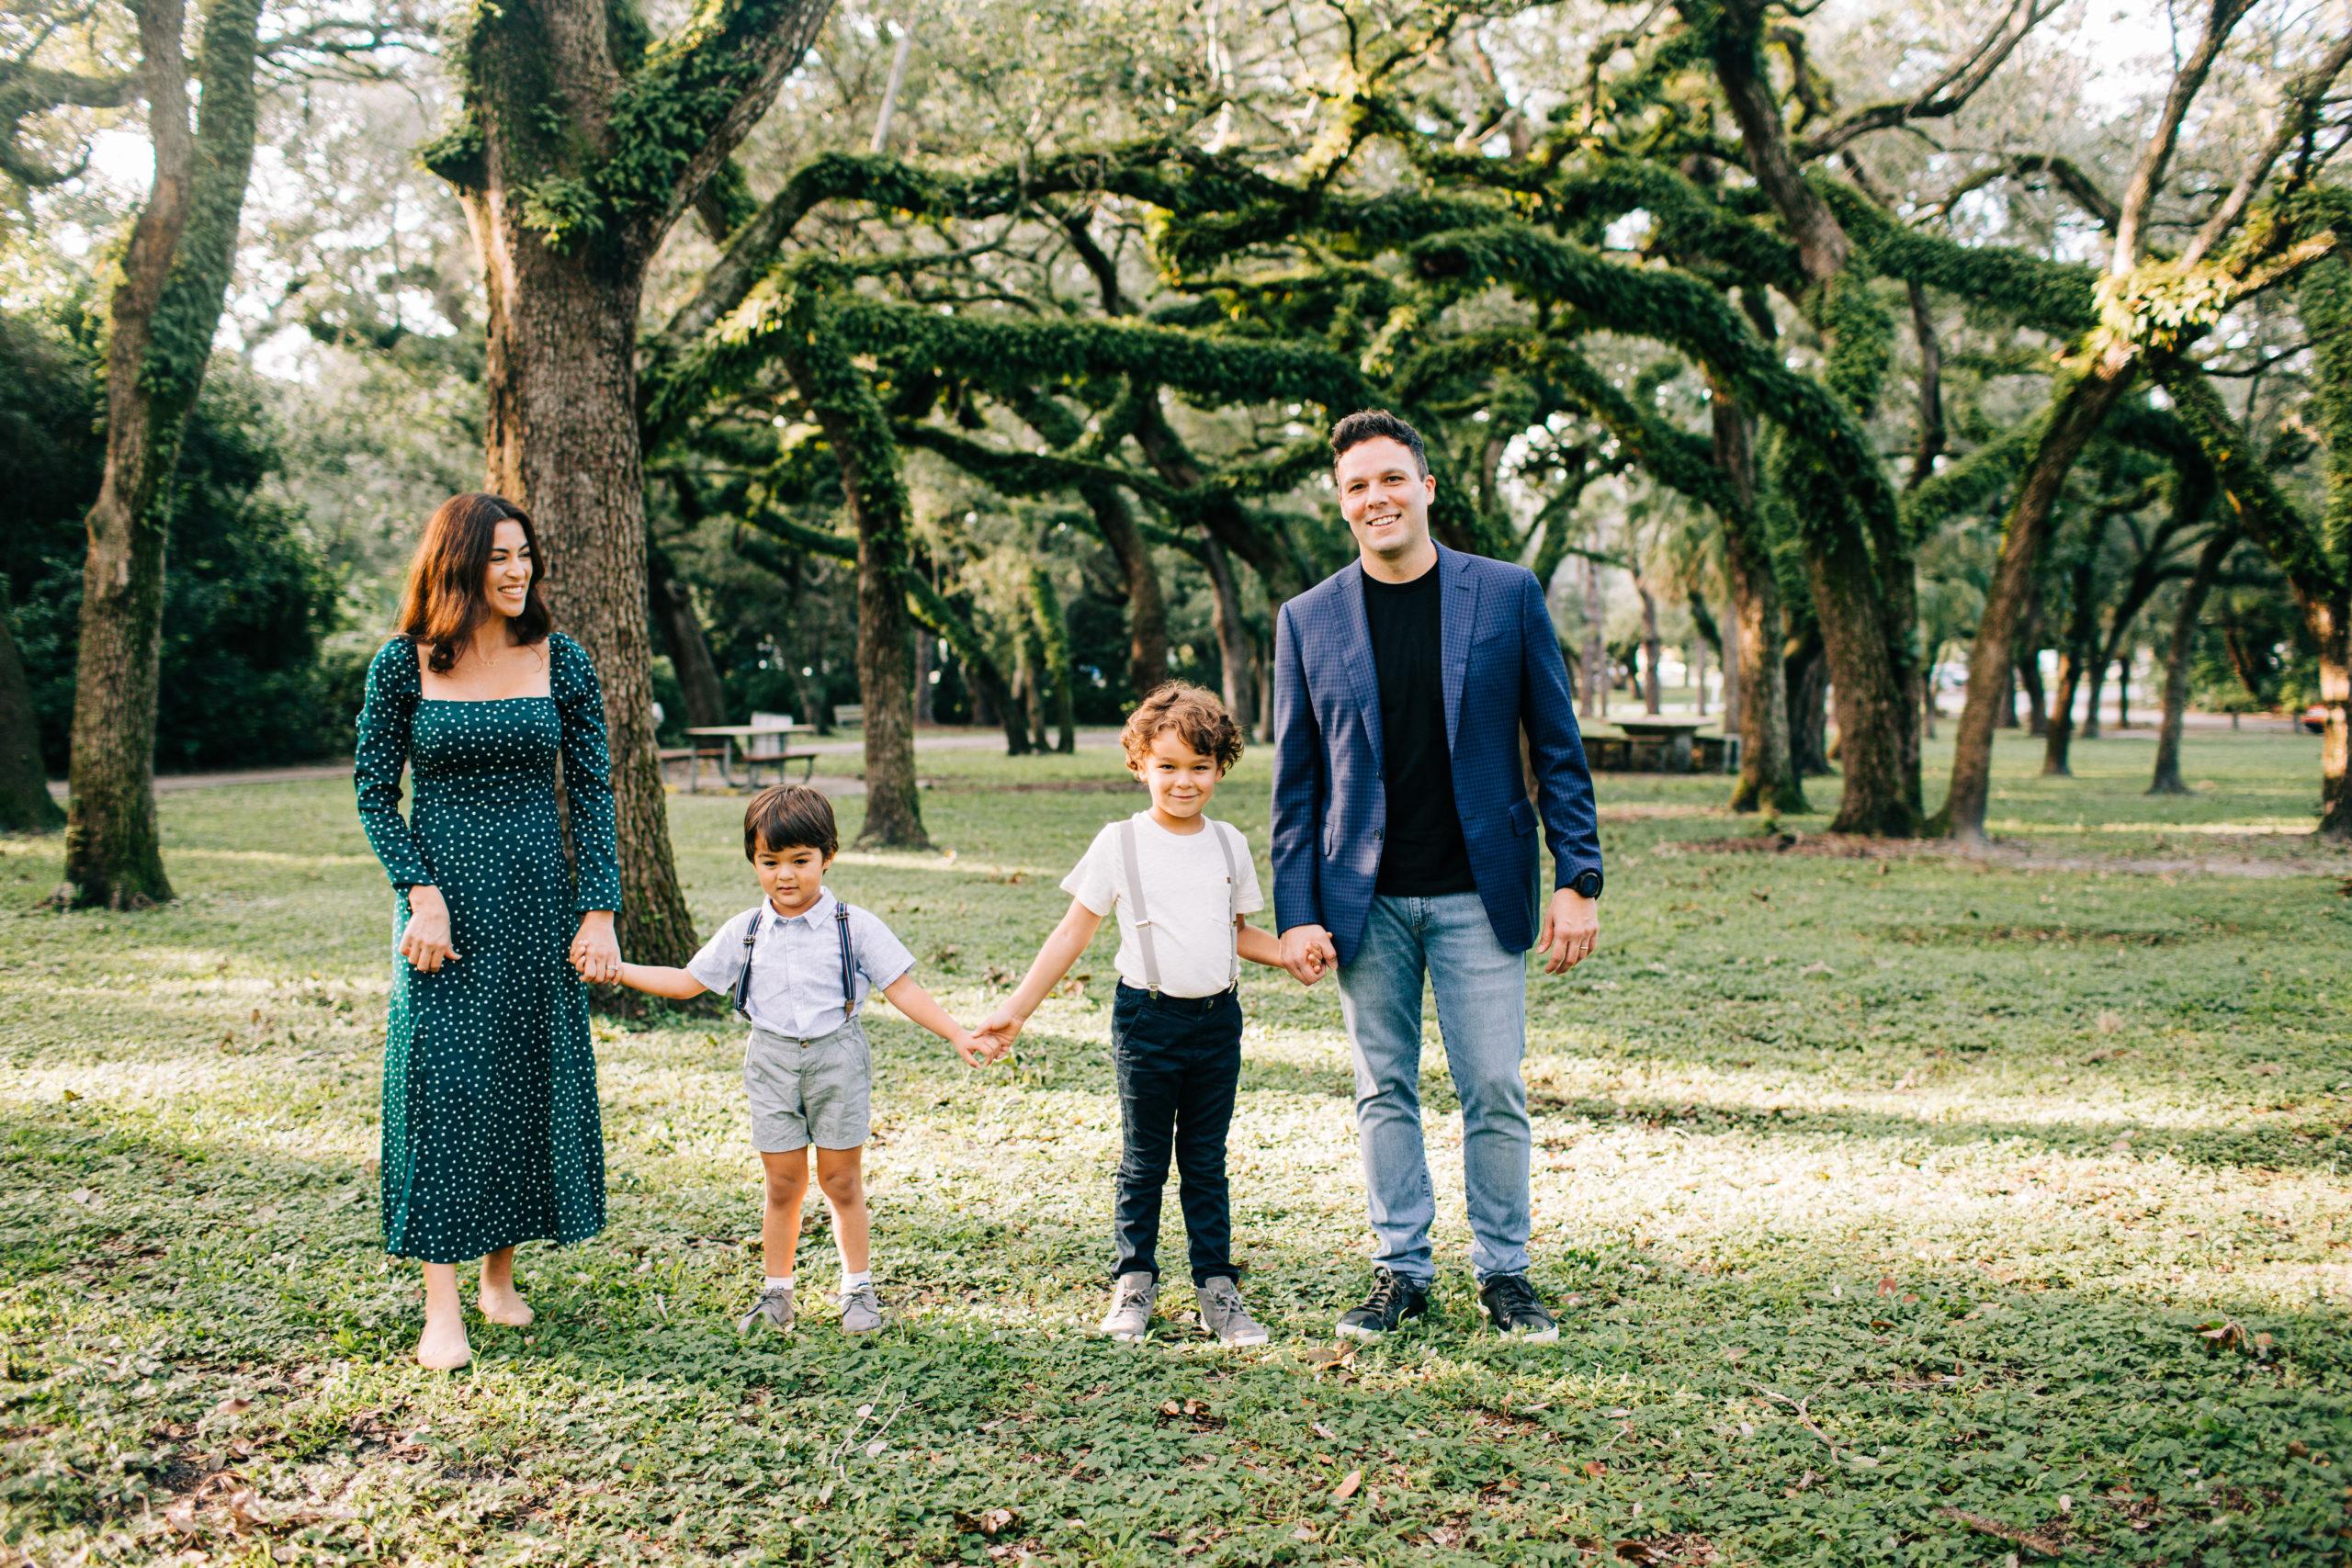 MiamiFamilyPhotoSession-scaled Family Photo Session at the Park - Villa Family